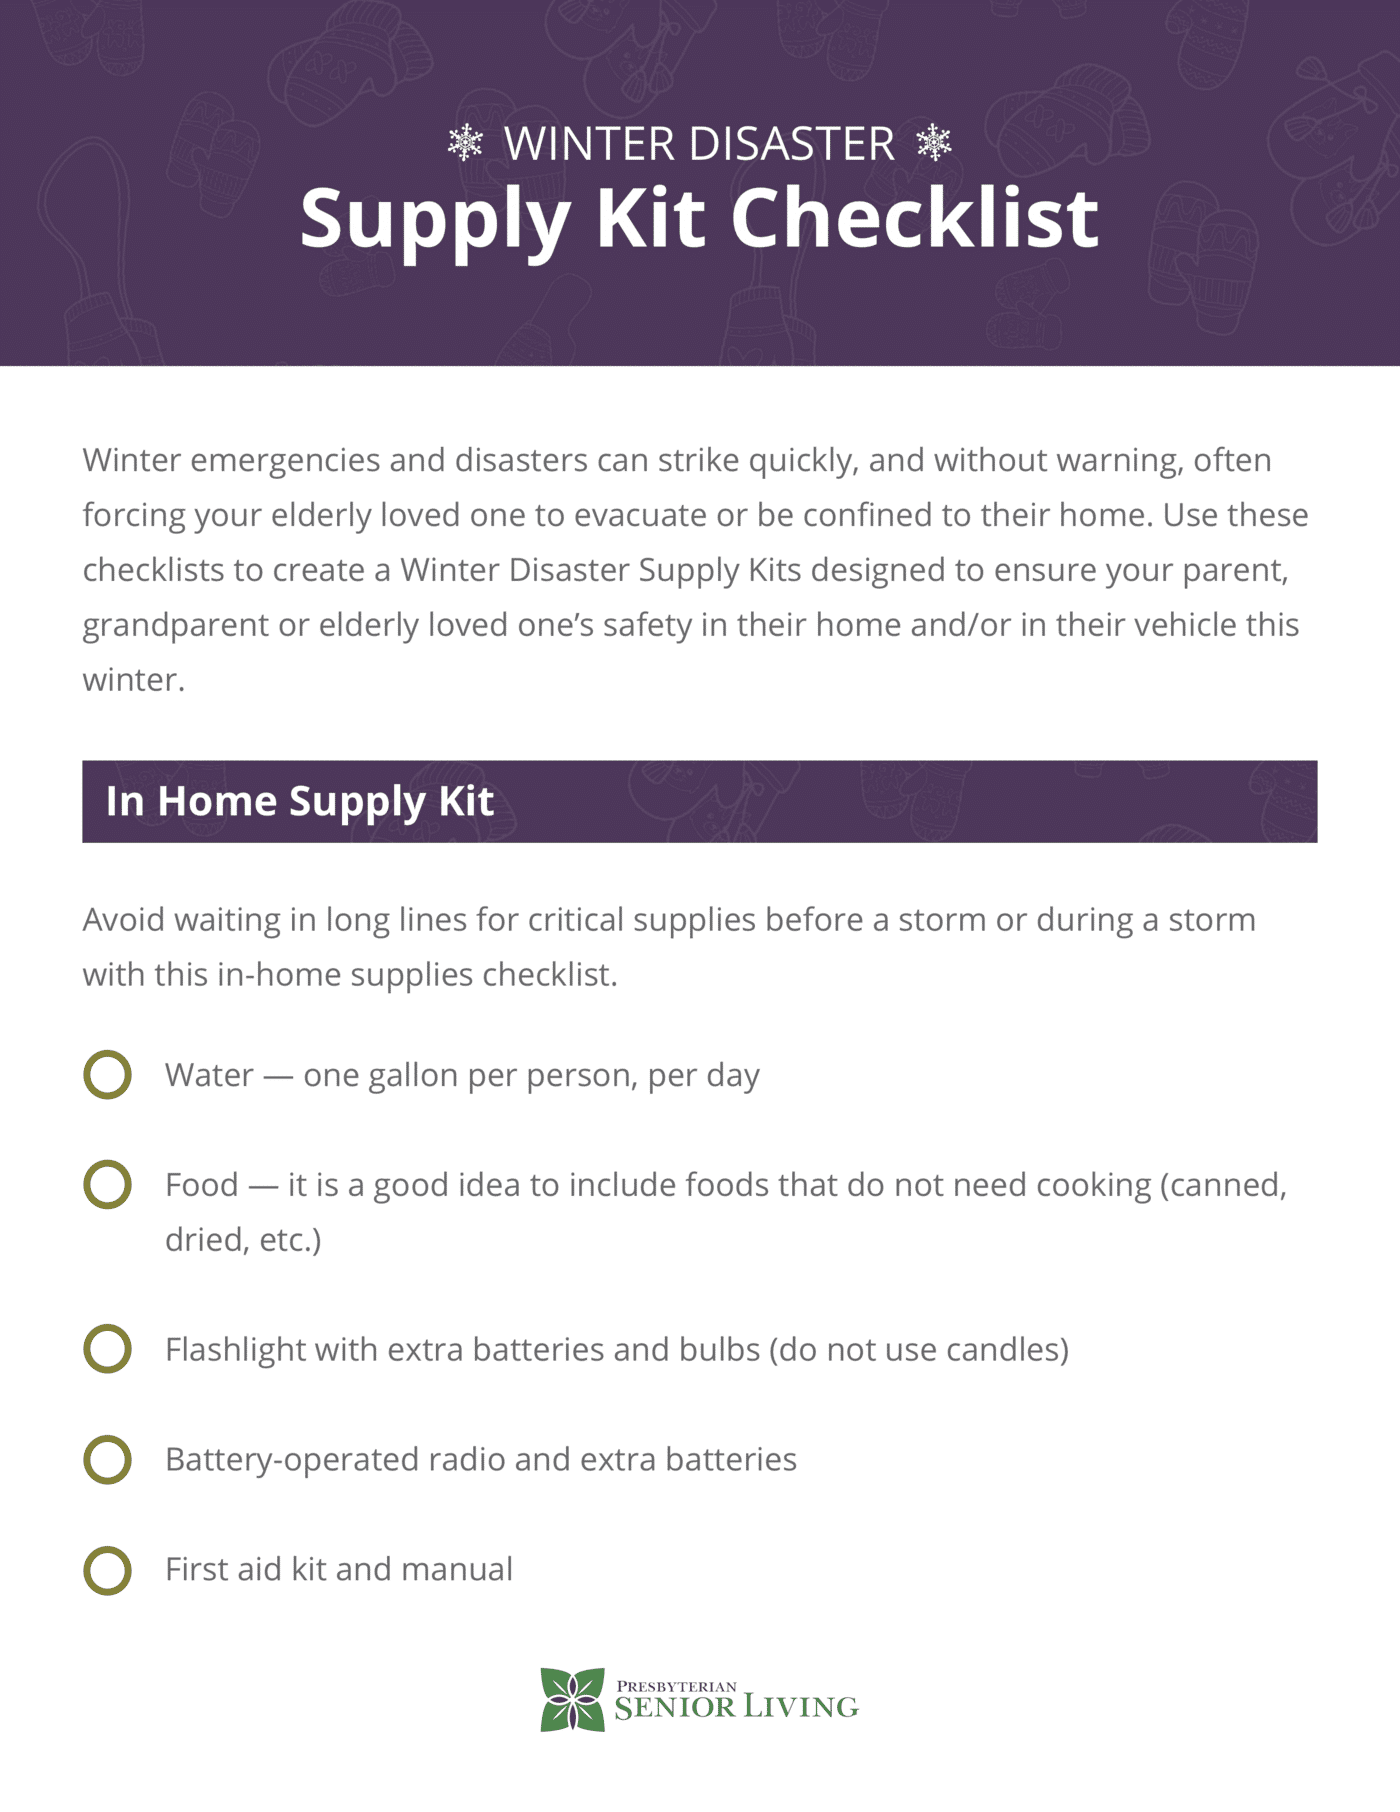 Resources   Winter Disaster Supply Kit Checklist